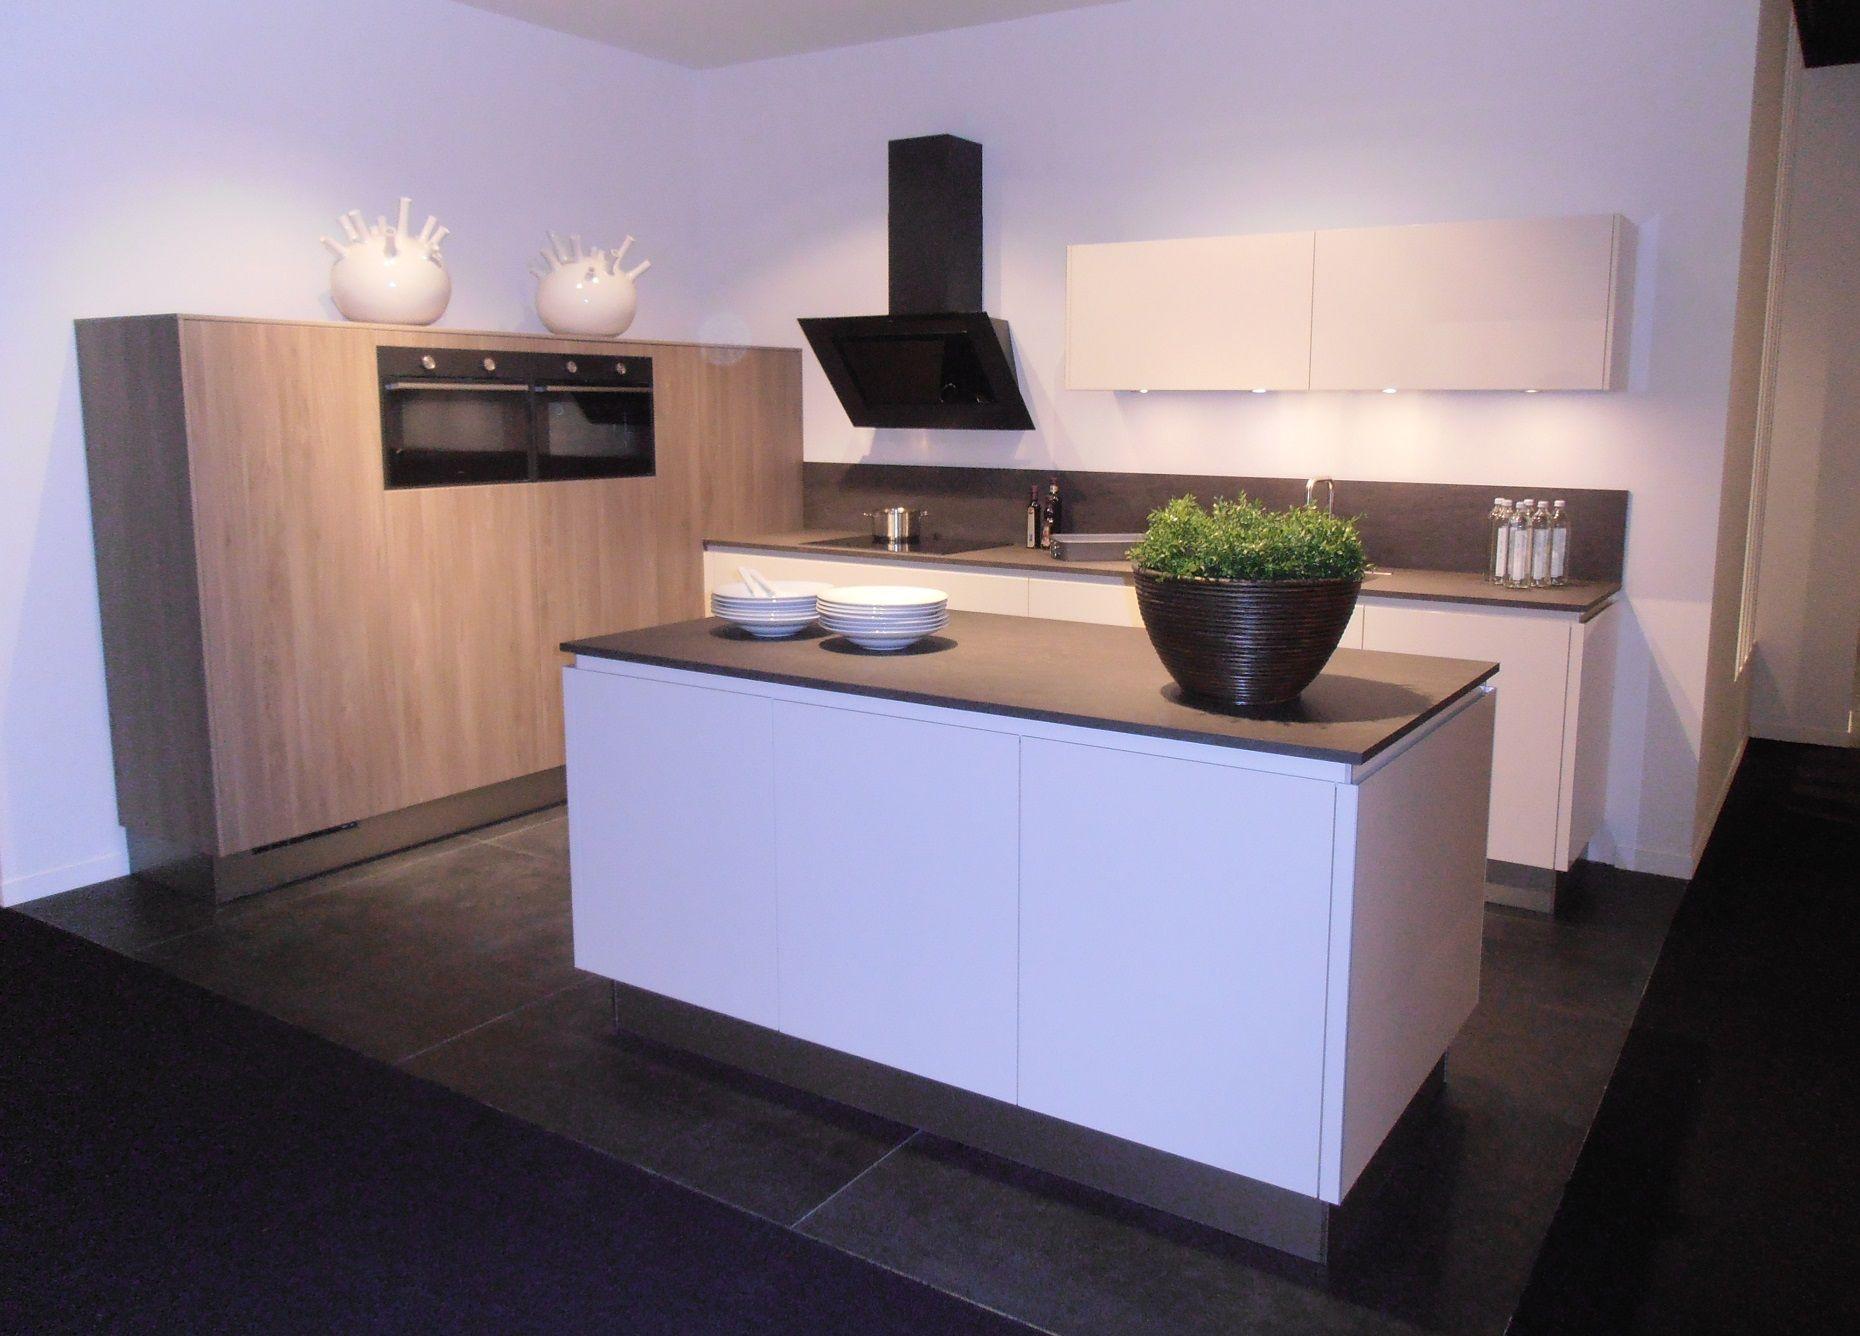 Eilandkeuken met atag apparatuur 50706 - Eigentijdse keuken met centraal eiland ...